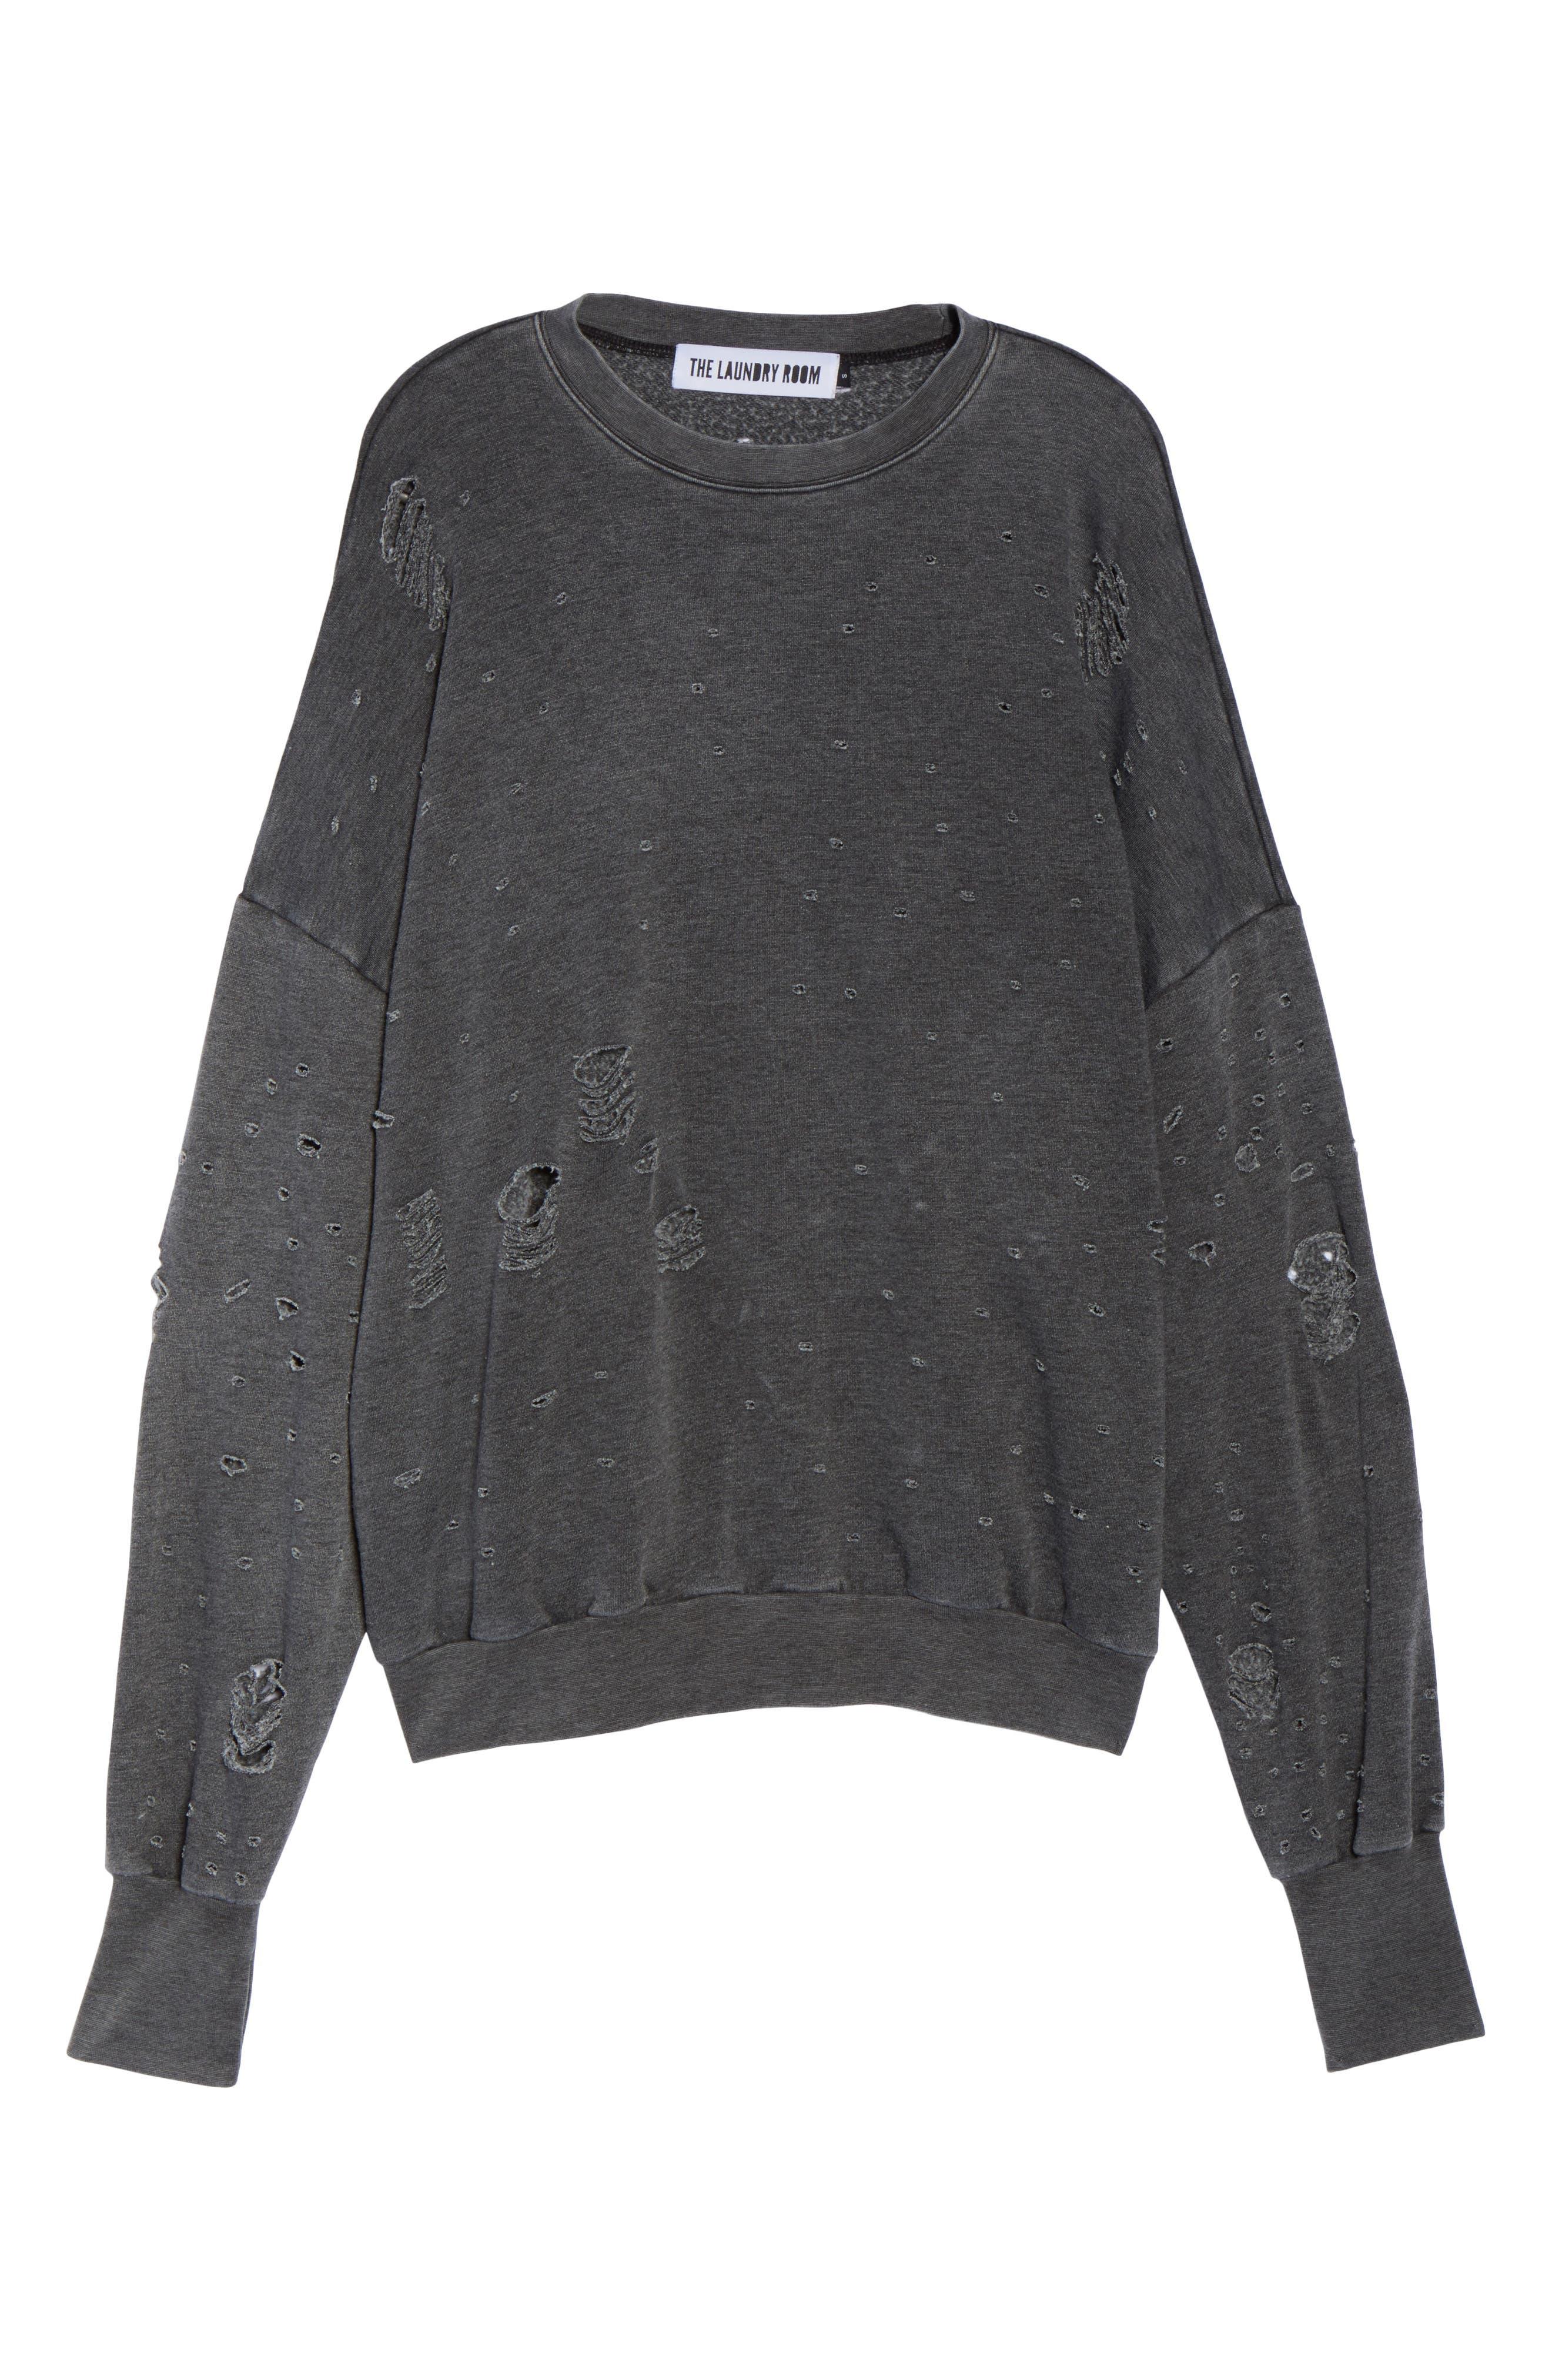 Thrasher Sweatshirt,                             Alternate thumbnail 6, color,                             020